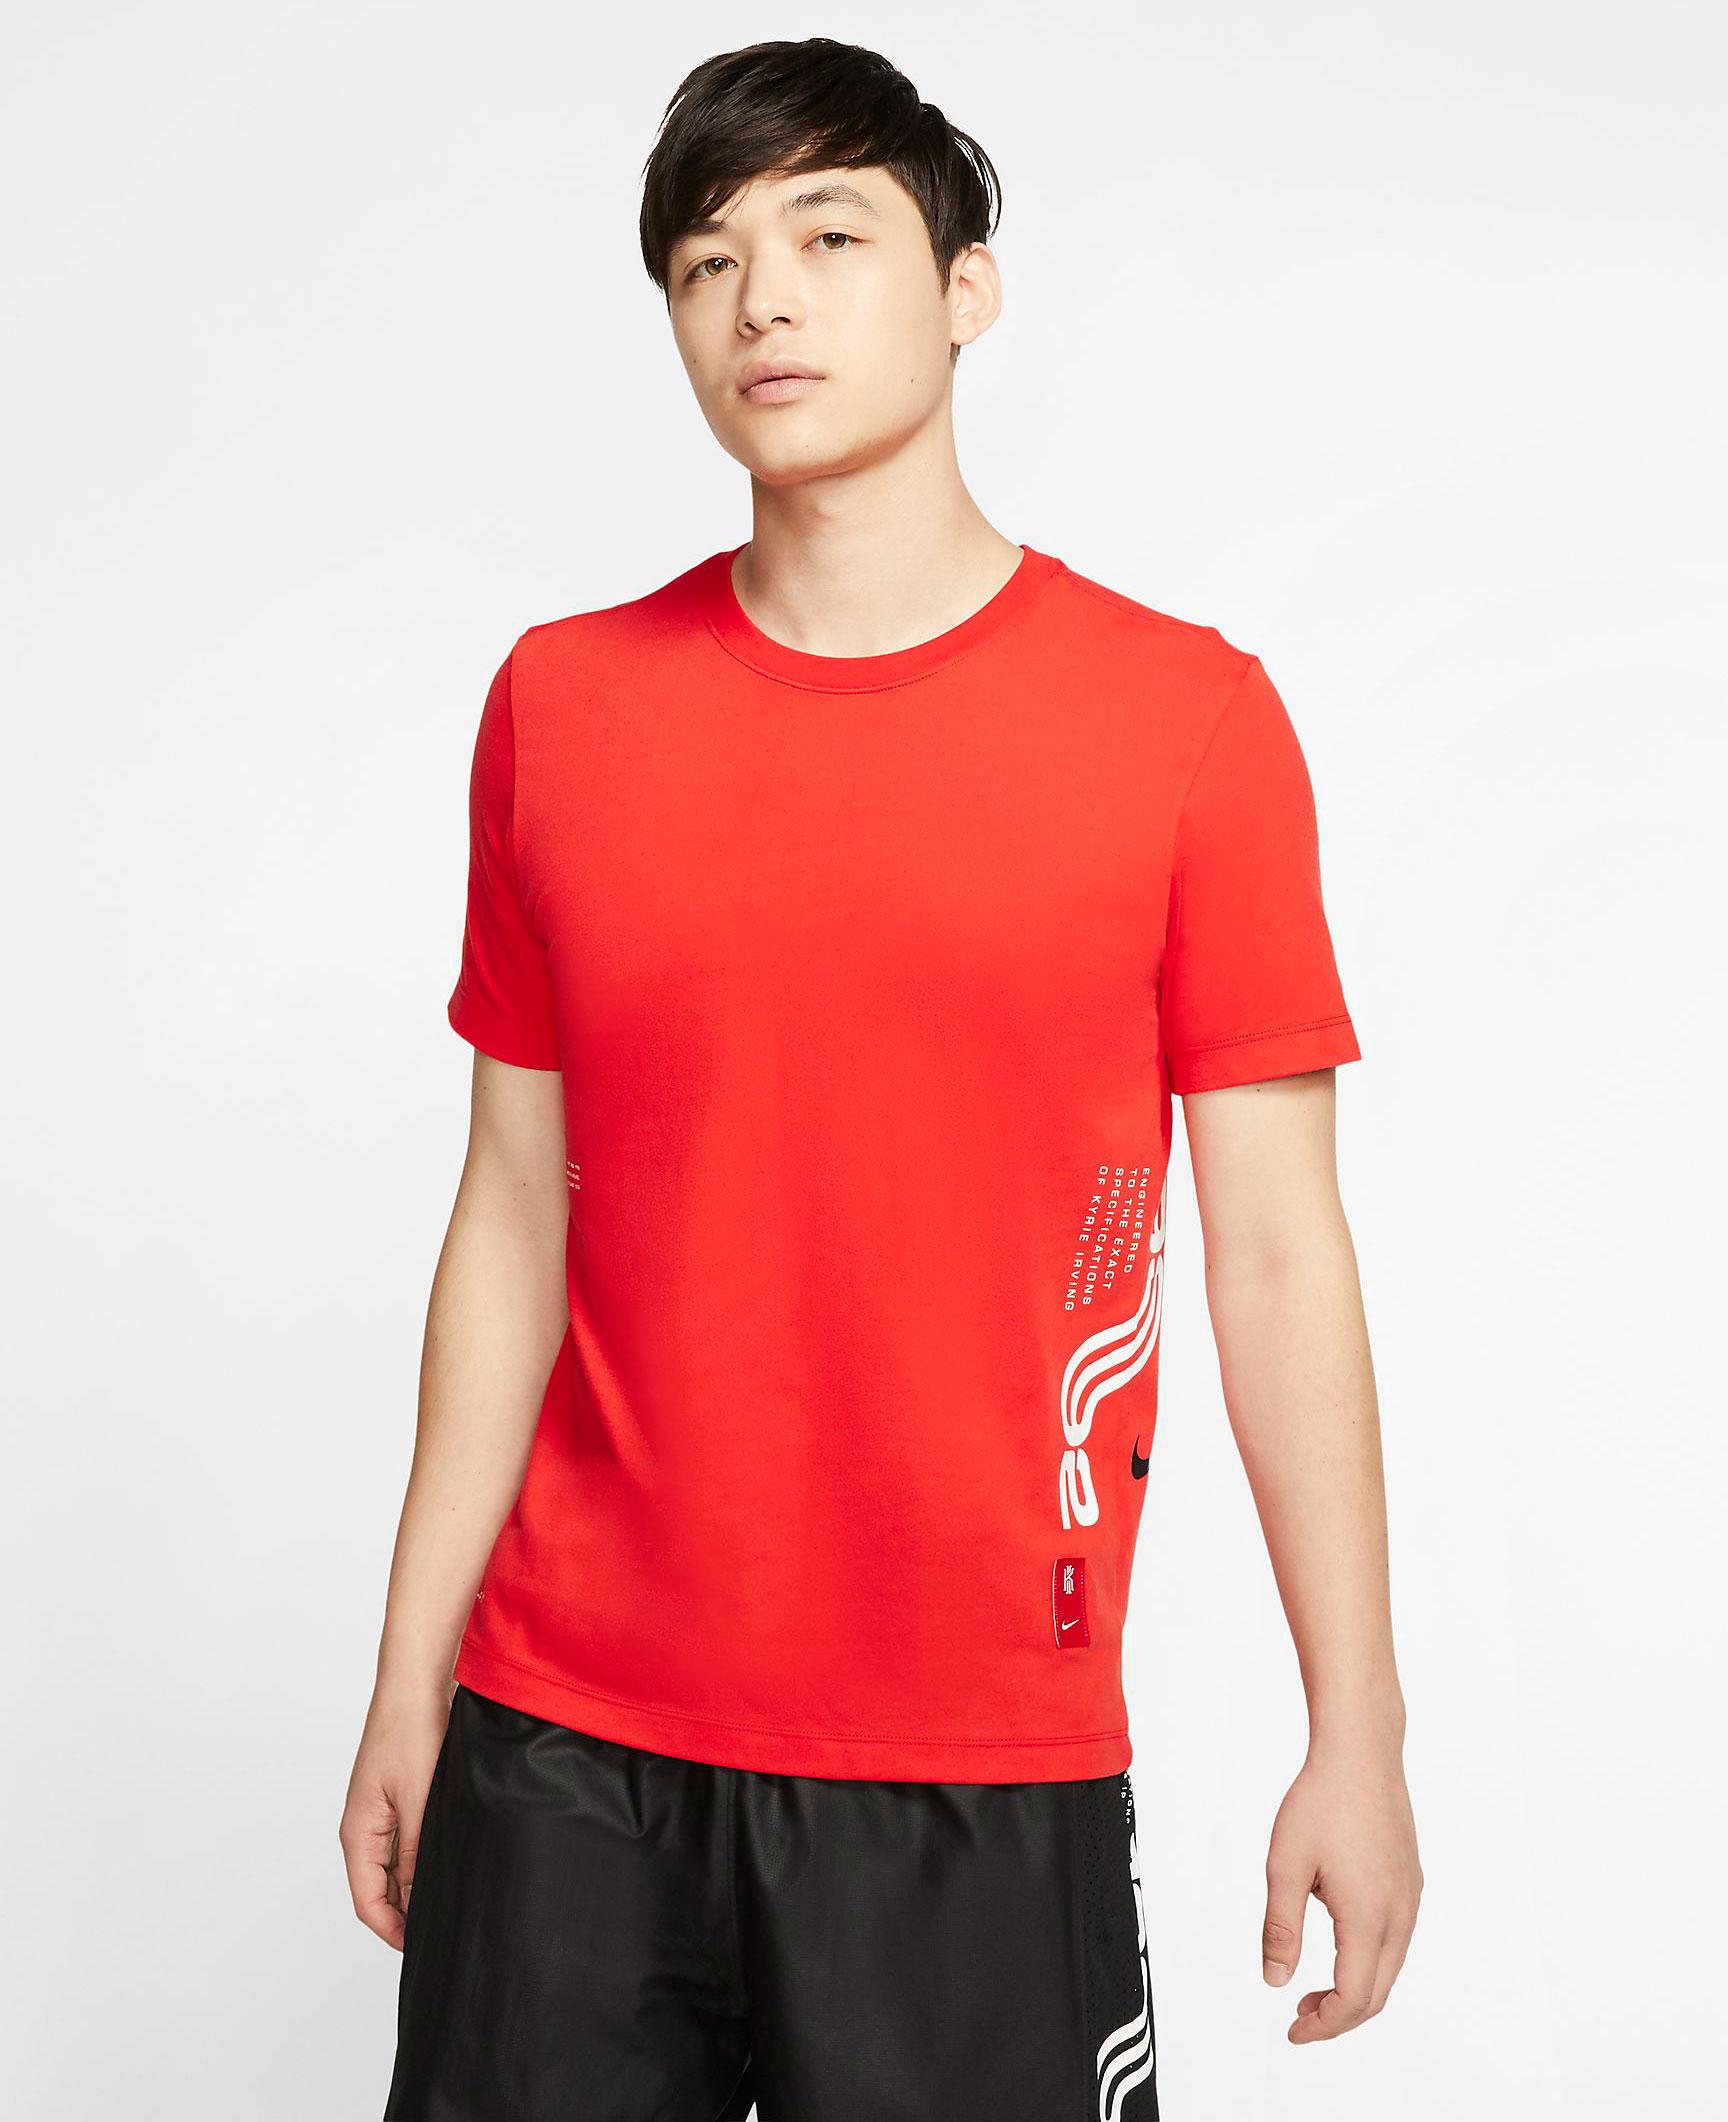 nike-kyrie-6-trophies-shirt-1